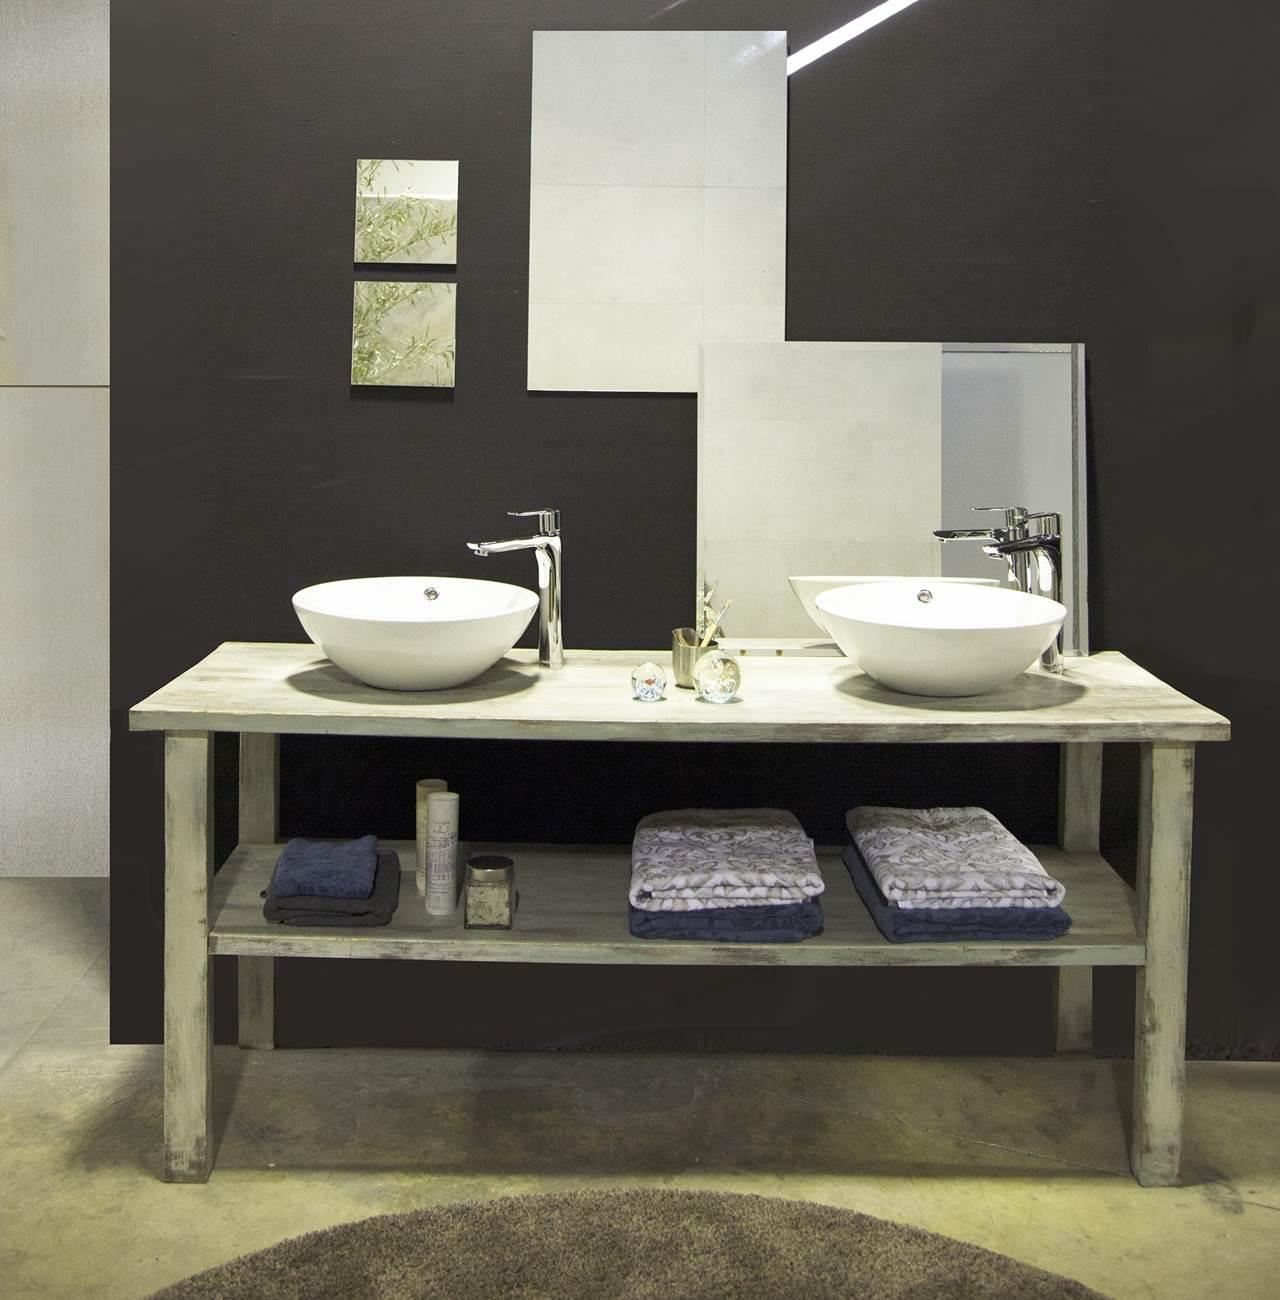 Griferia ypsilon plus de Rovira, Novedades baños, Tono Bagno Barcelona